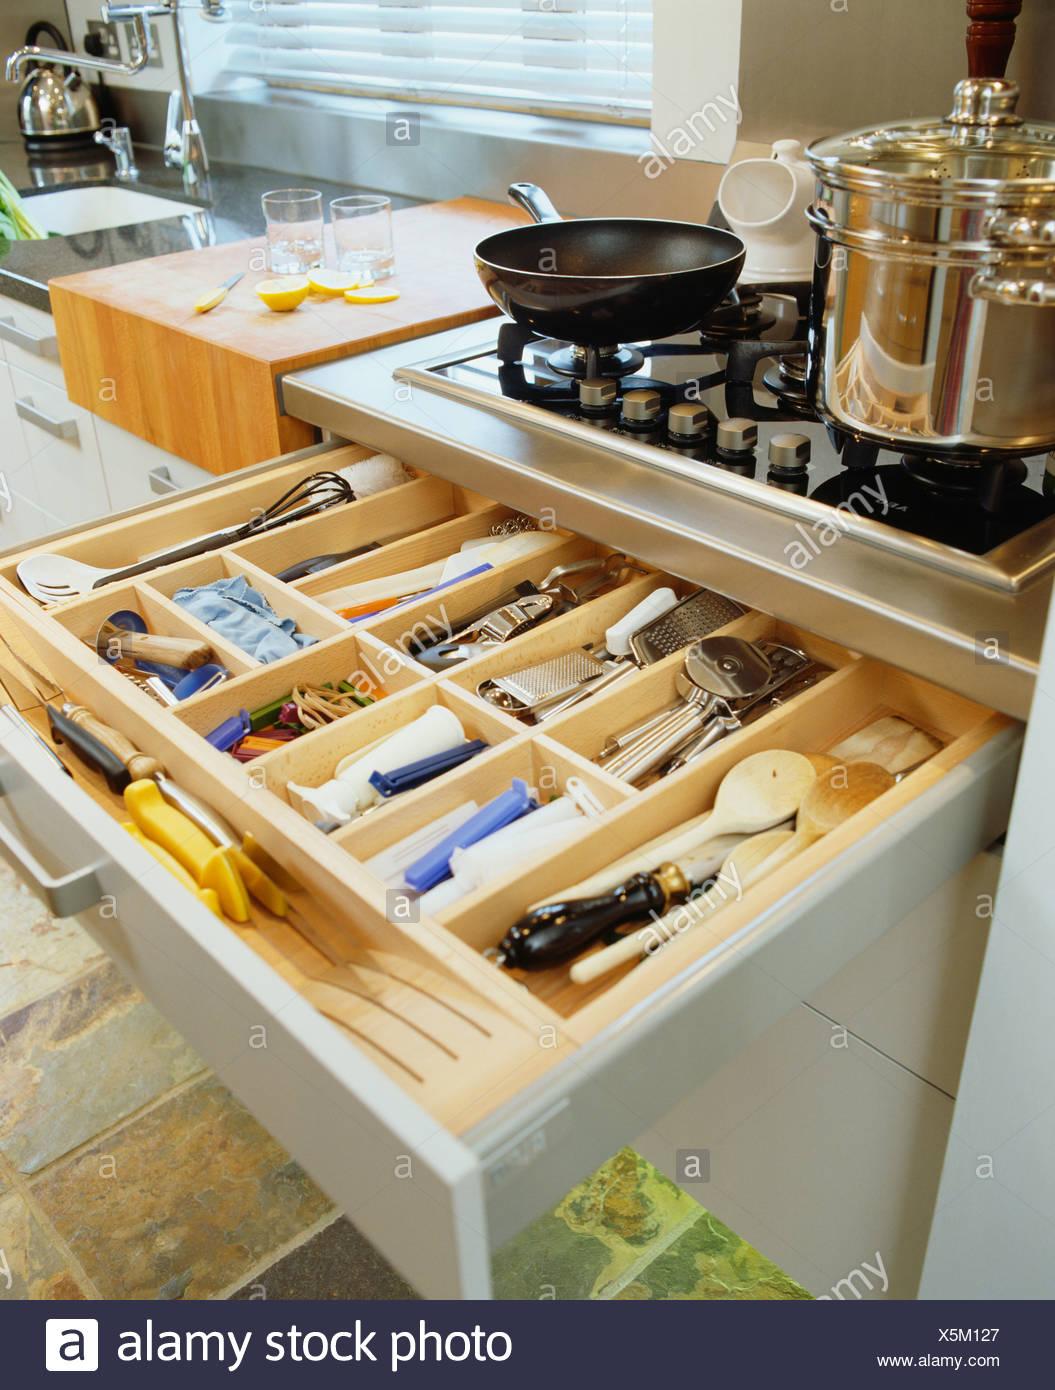 Close Up Of Open Cutlery Storage Drawer Below Pans On Kitchen Hob